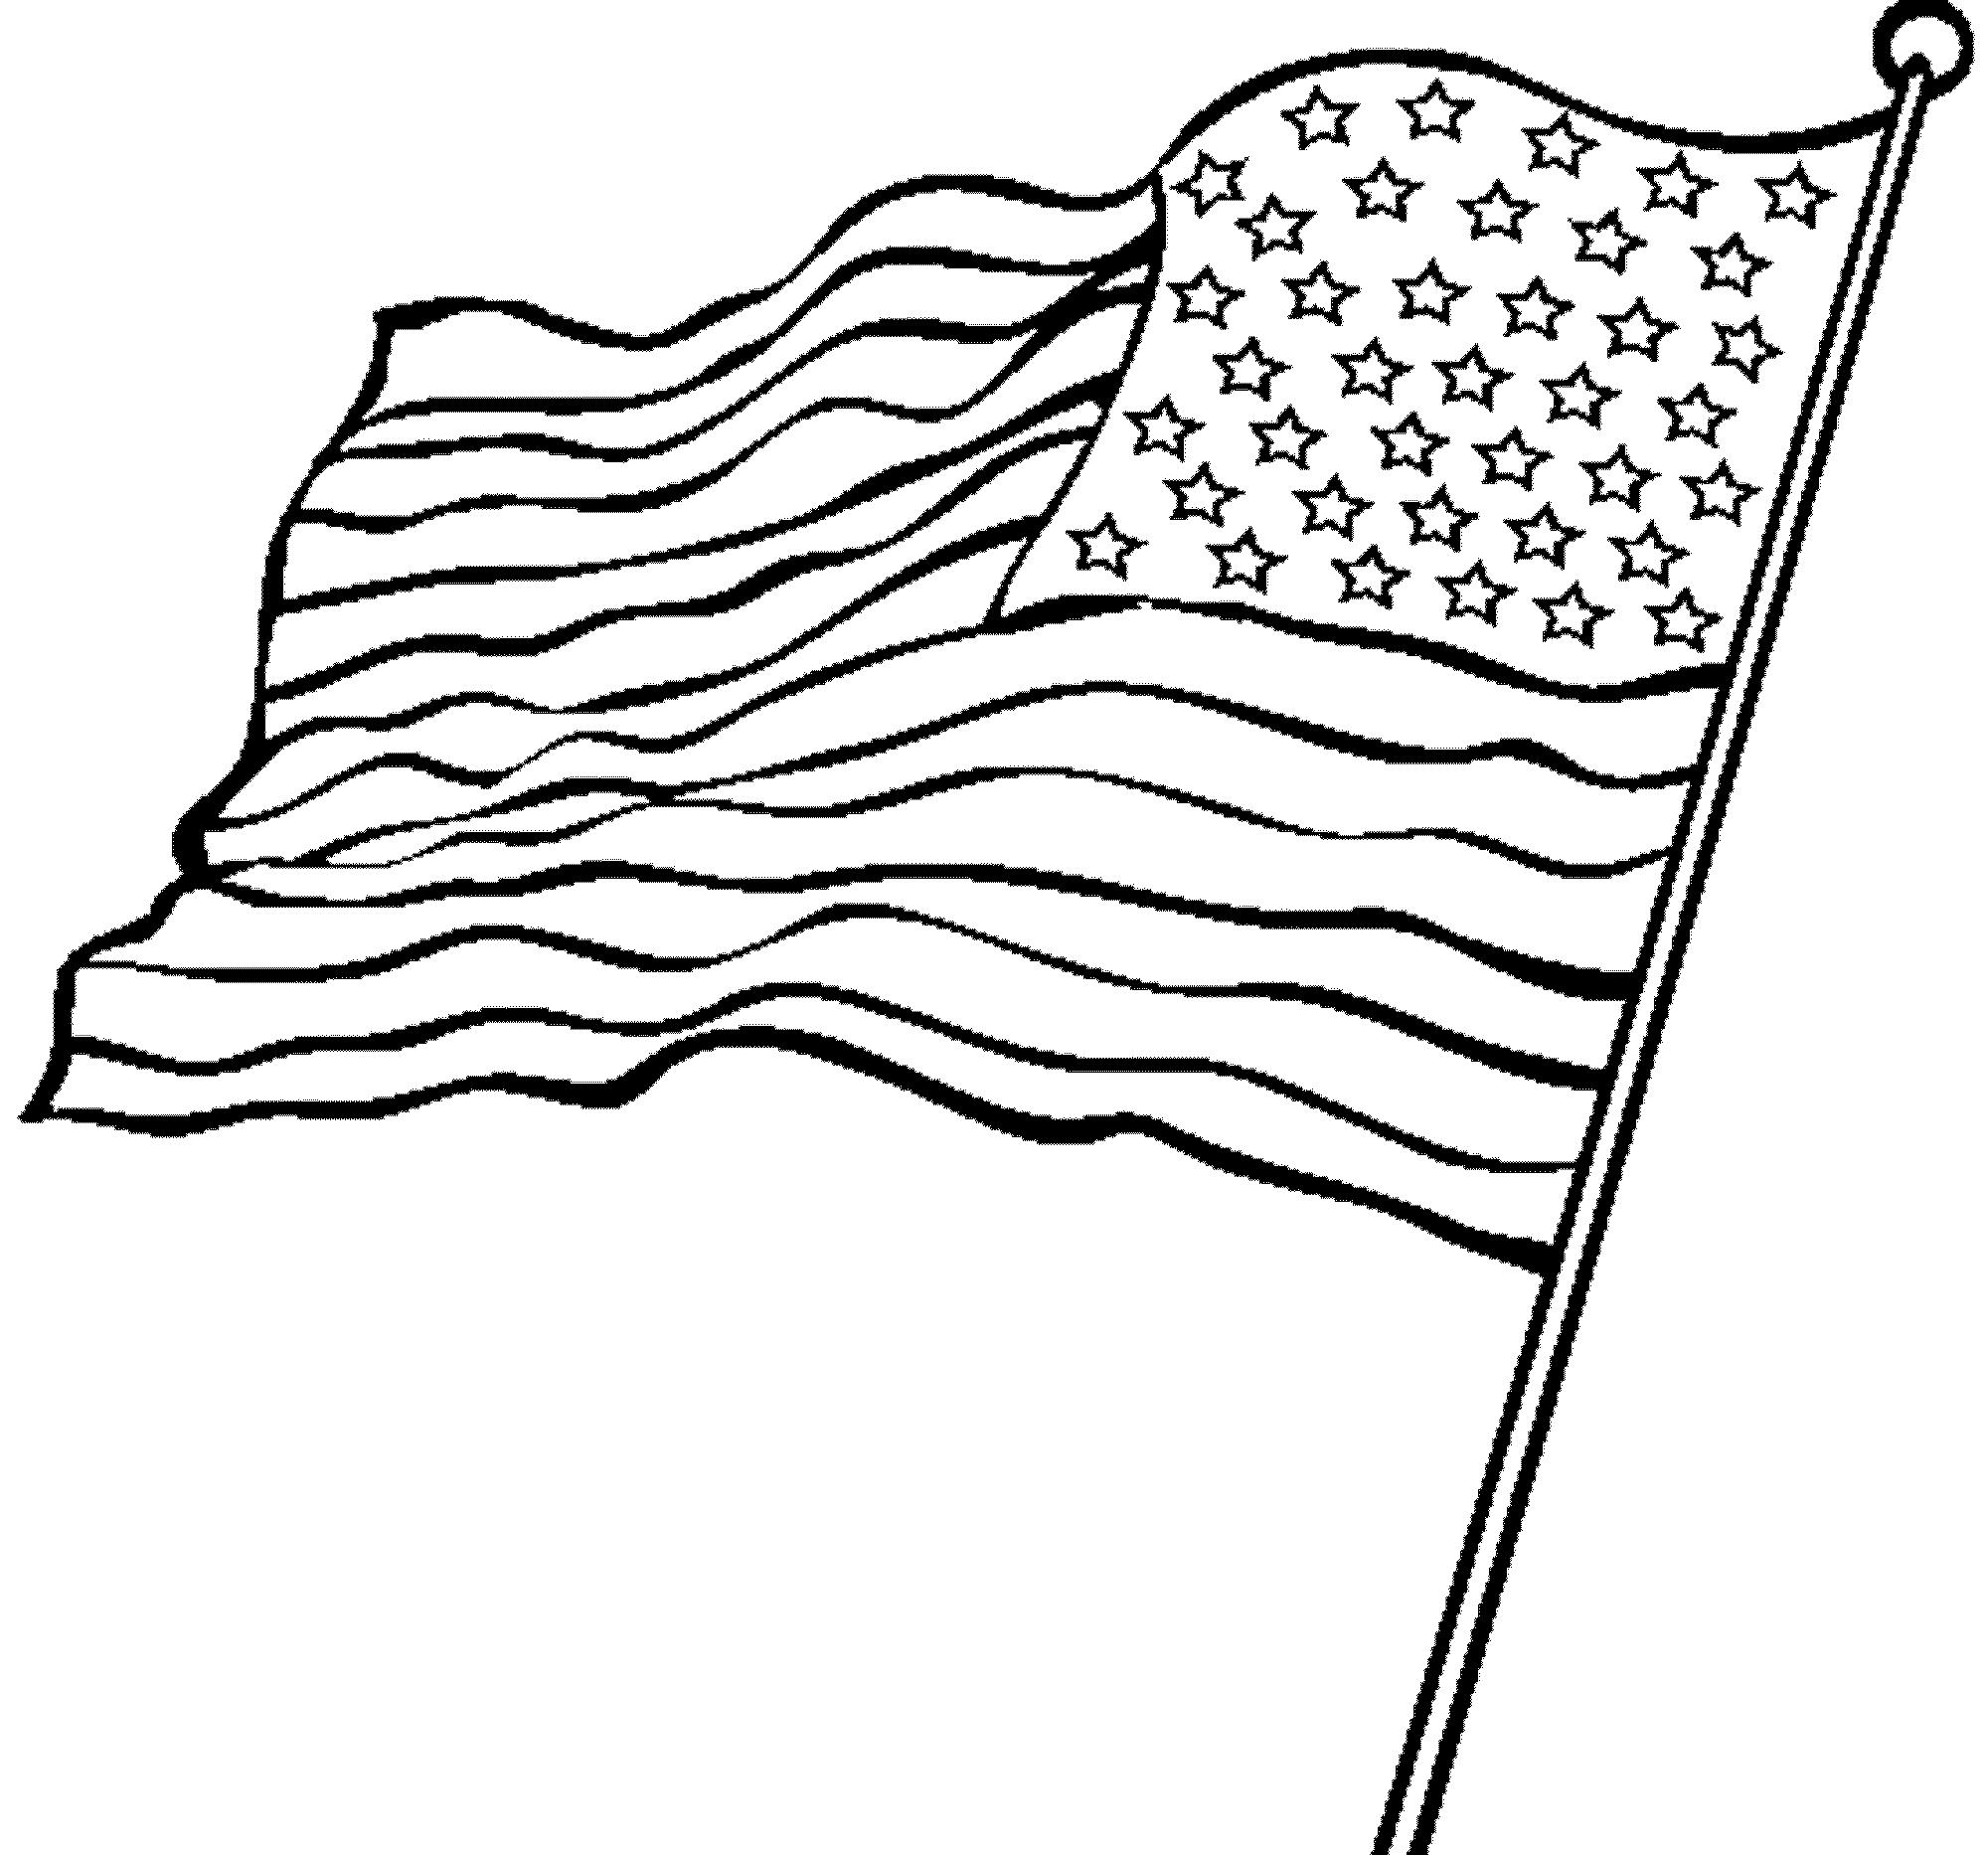 american flag to color original american flag coloring page coloring home color flag to american